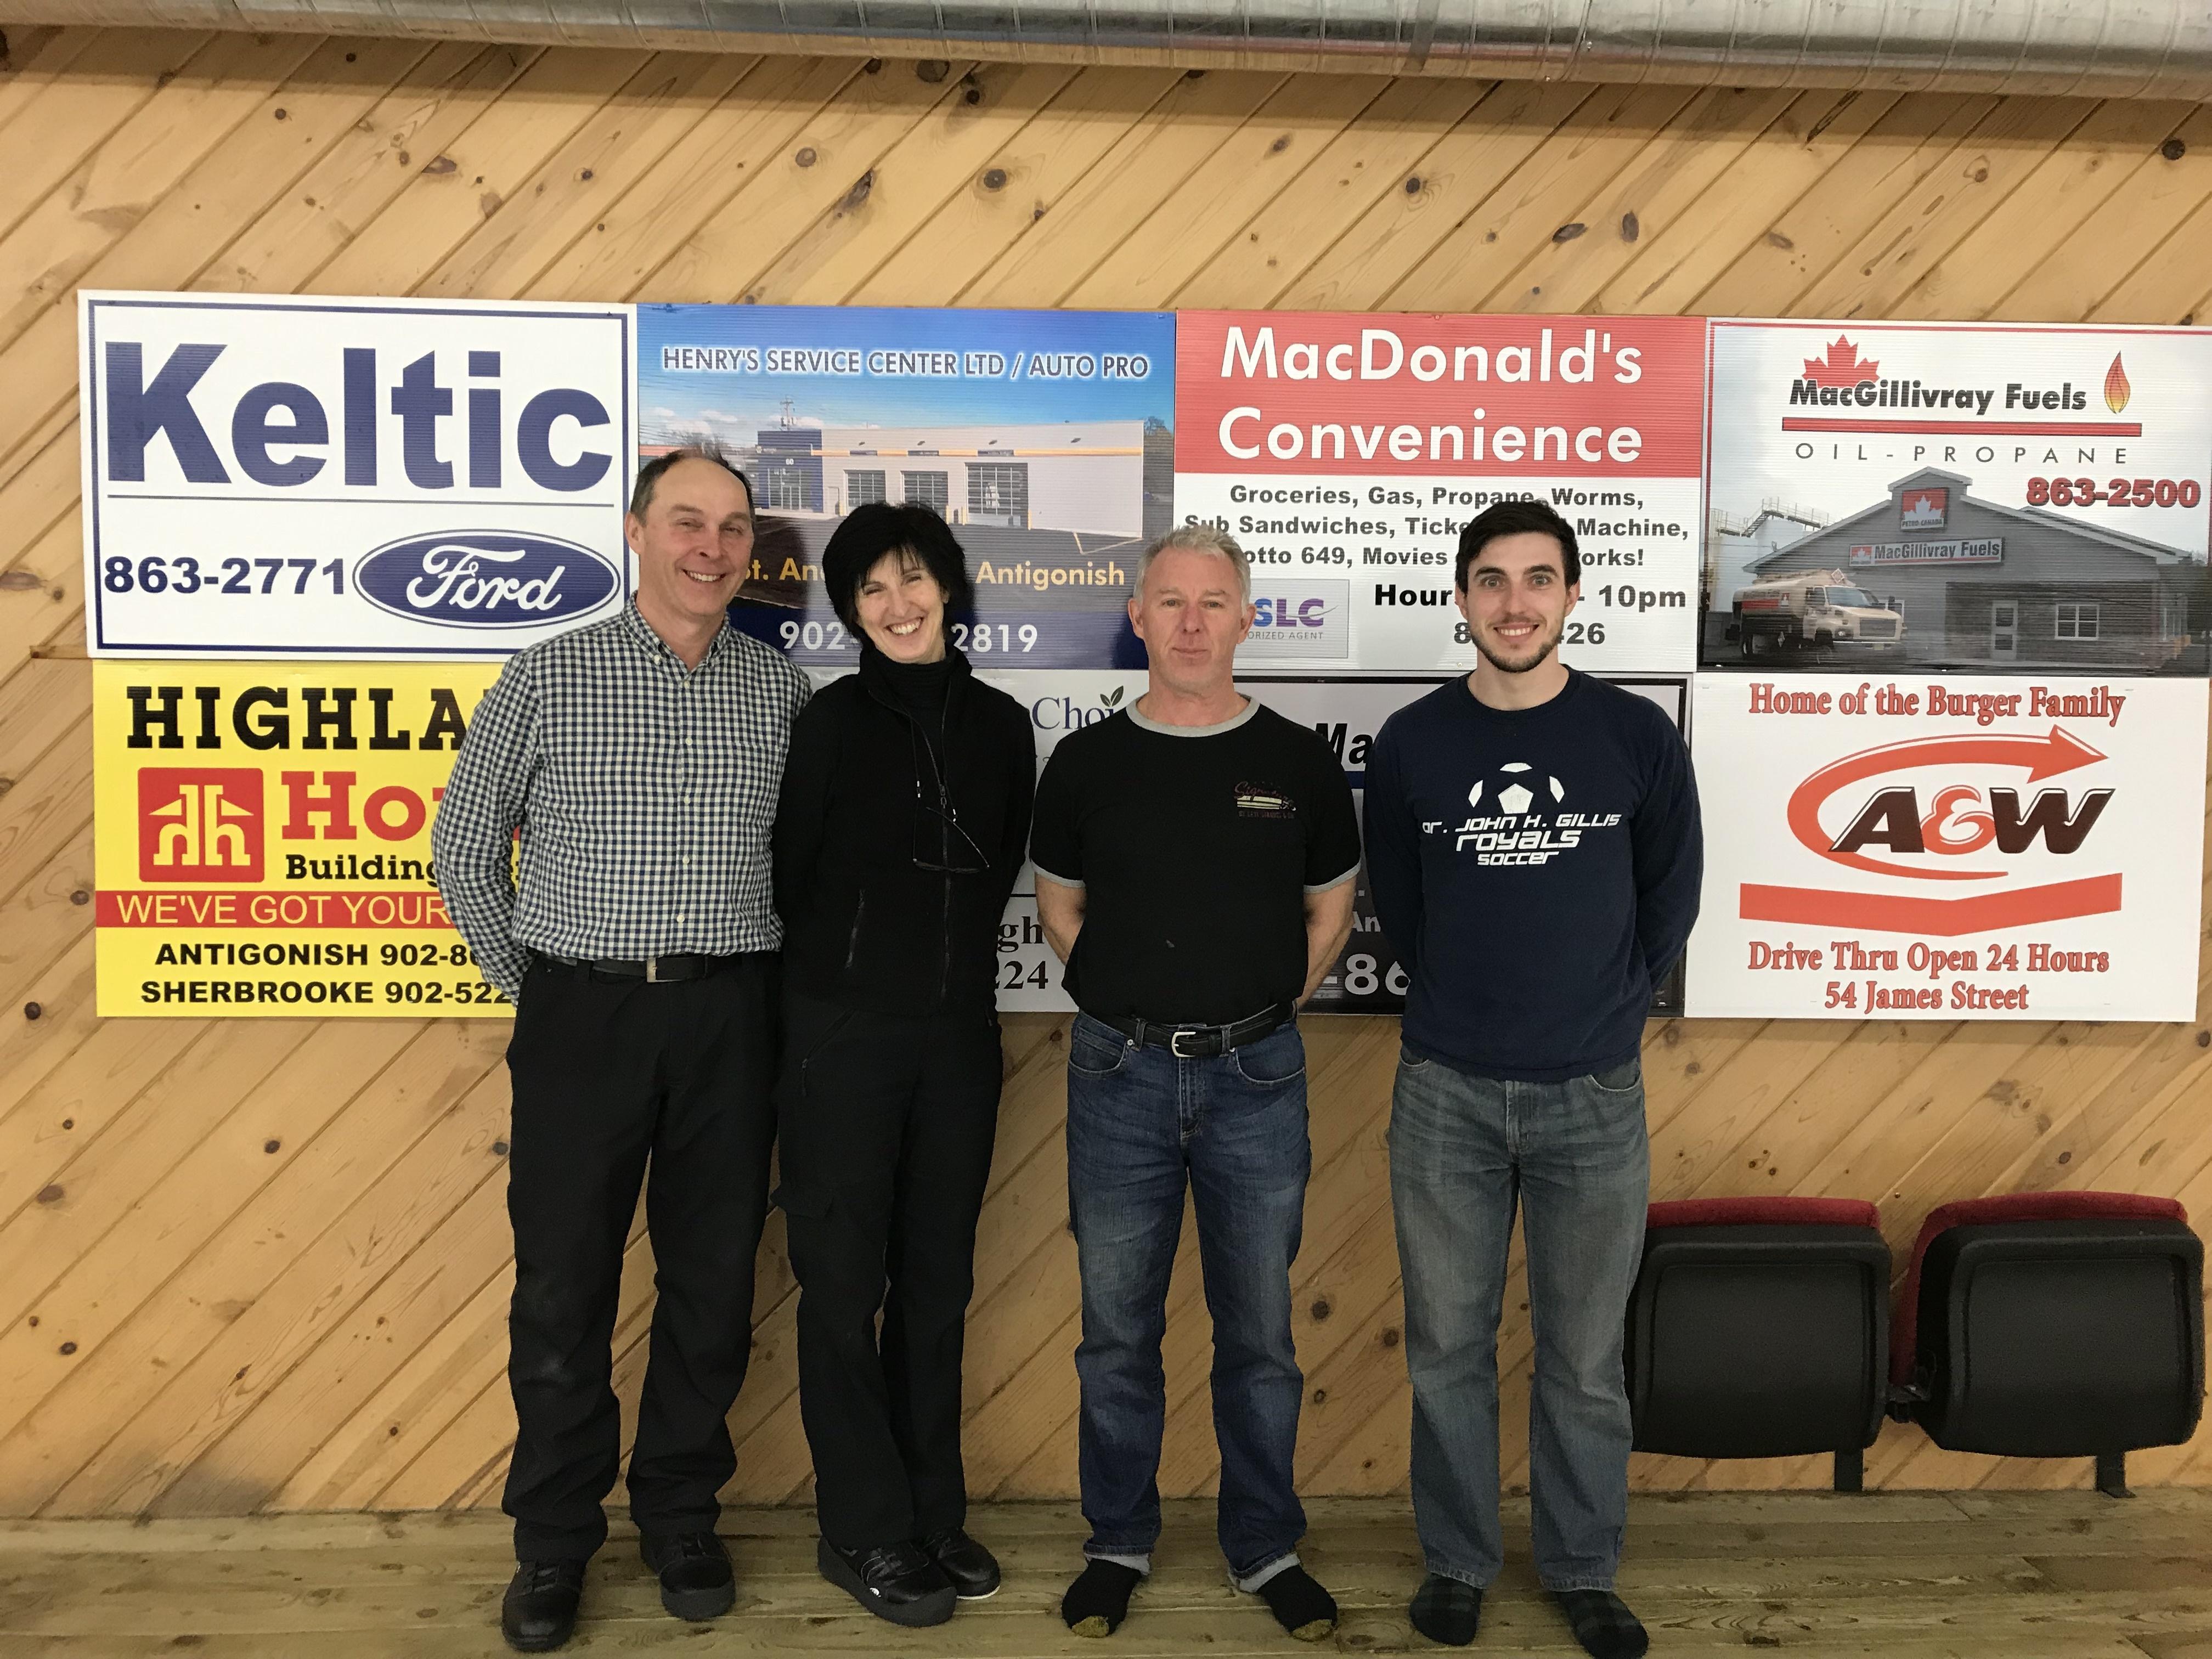 2nd Half Division C Winners: Steven Doiron, Susan Doiron, Cameron Gillis, Aly Gillis